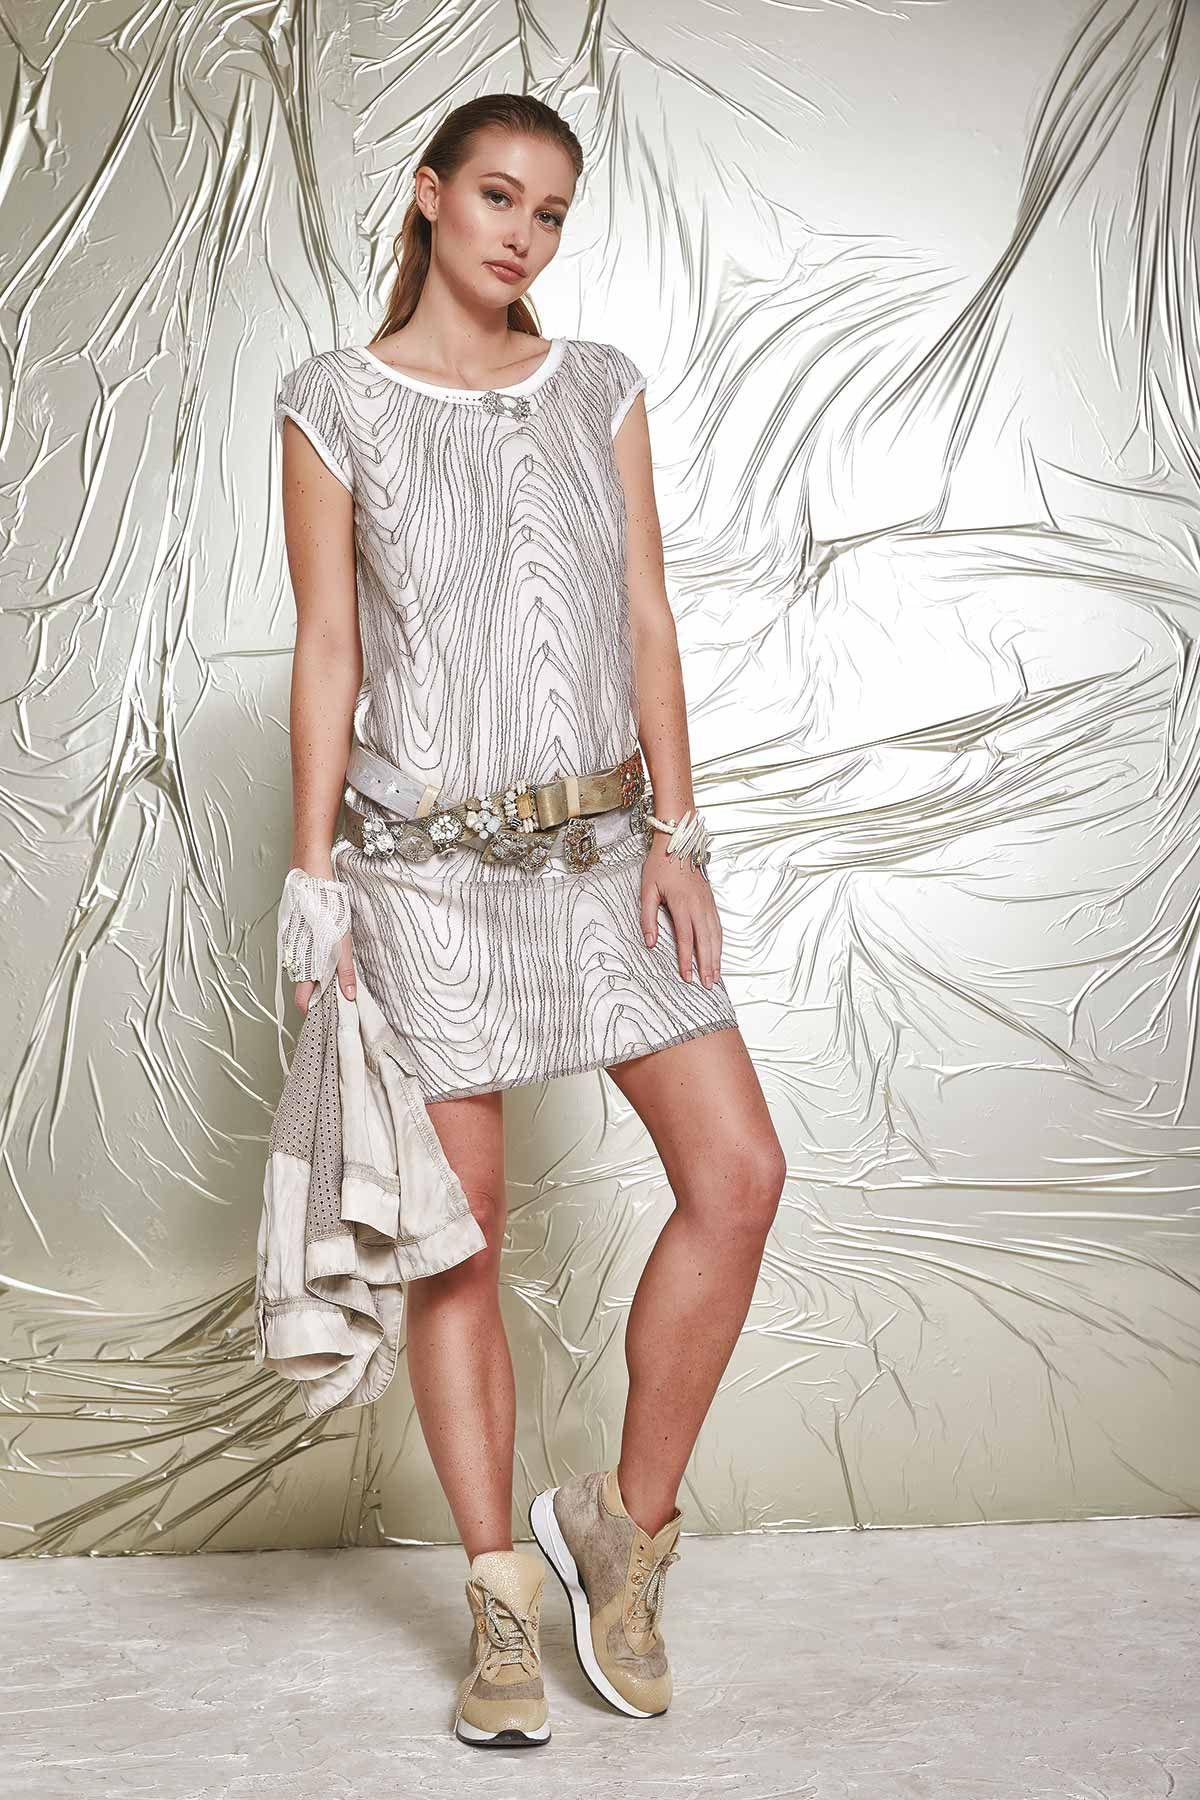 DANIELA DALLAVALLE - Lookbook #collection #danieladallavalle #elisacavaletti #woman #PE17 #shoes #dress #belt #jacket #gloves #bracelet